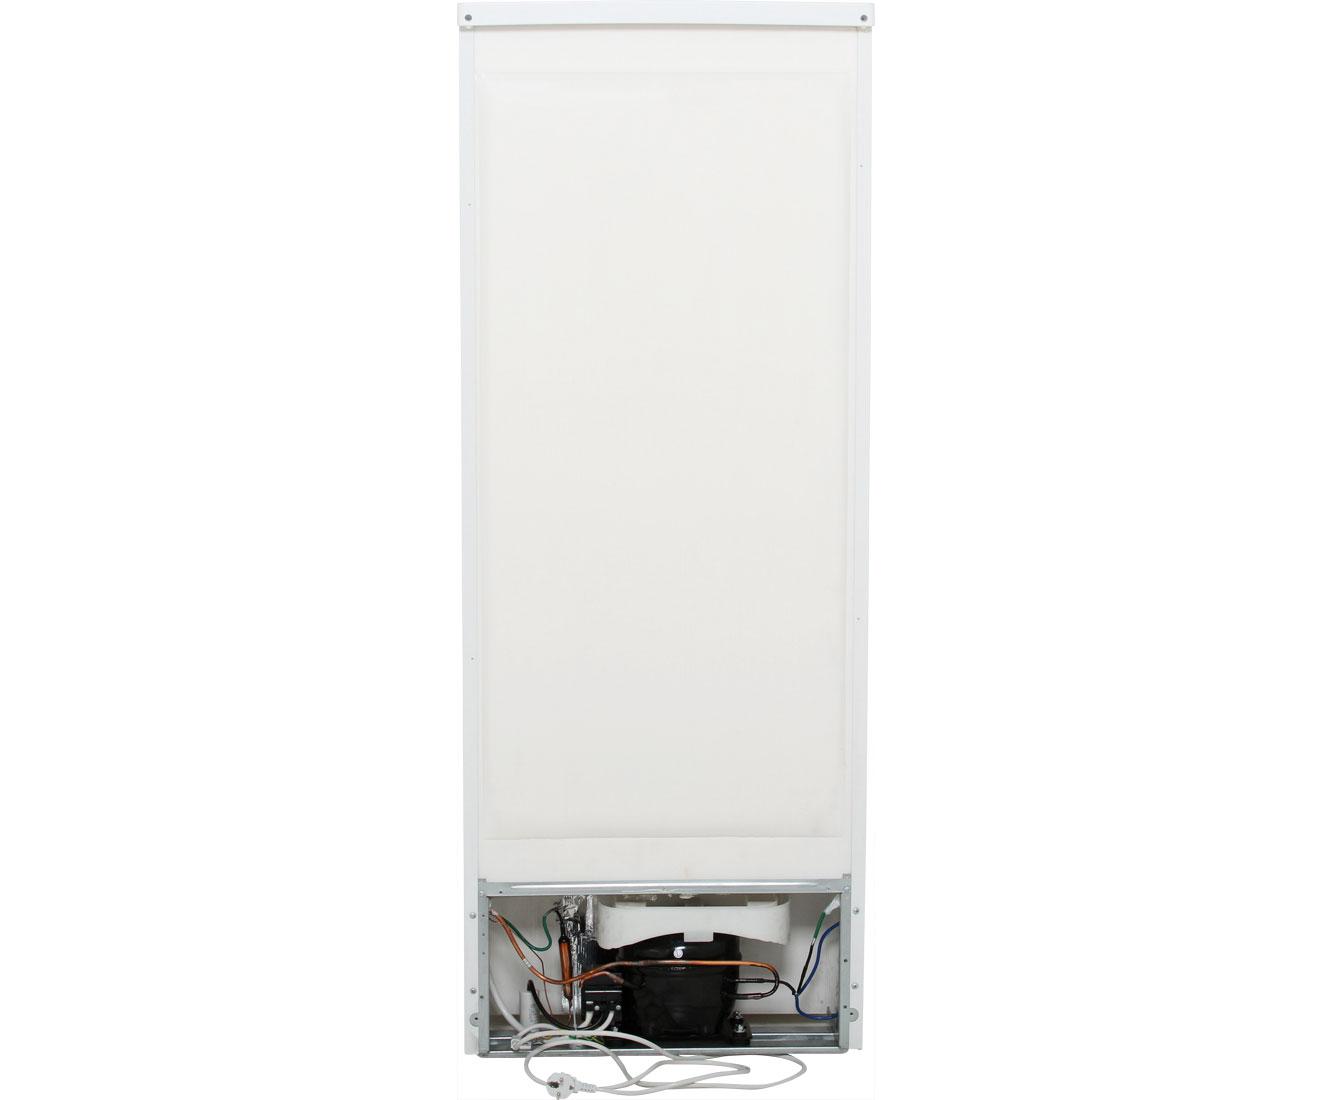 Amica Standkühlschrank Vks 15460 W : Amica vks w kühlschrank freistehend cm weiss neu ebay